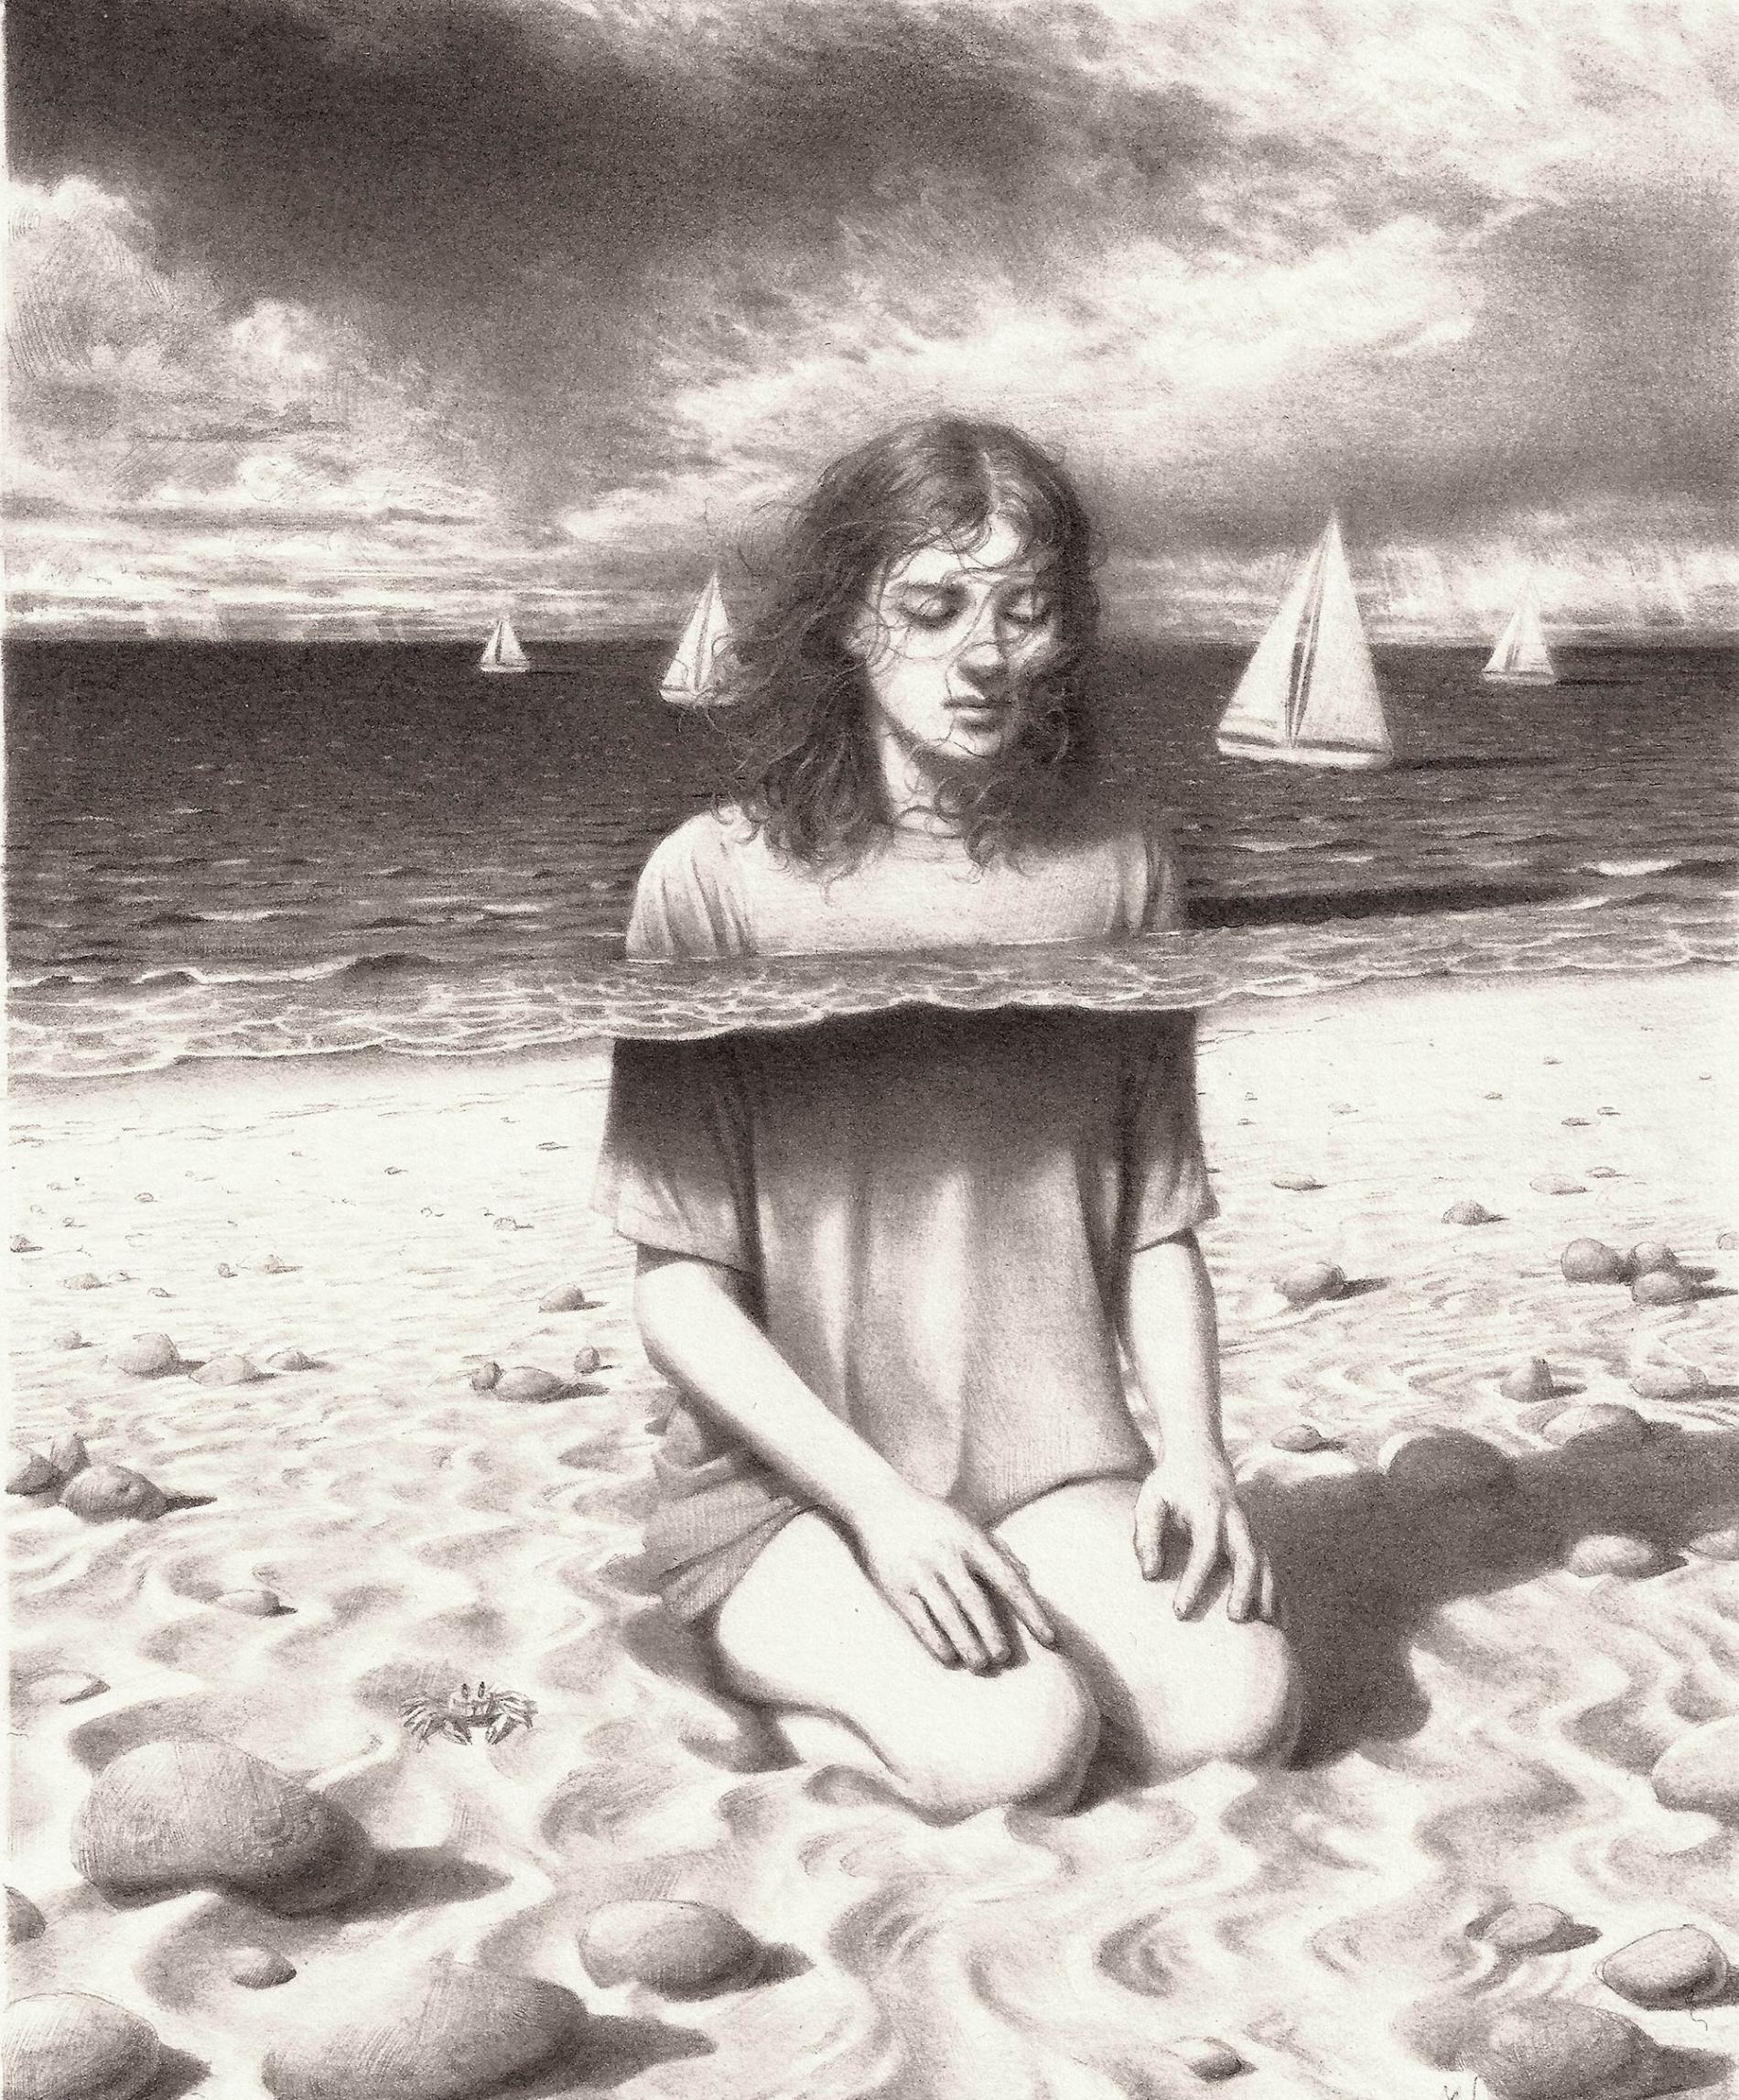 johnston retratos grafito metamorfosis mar